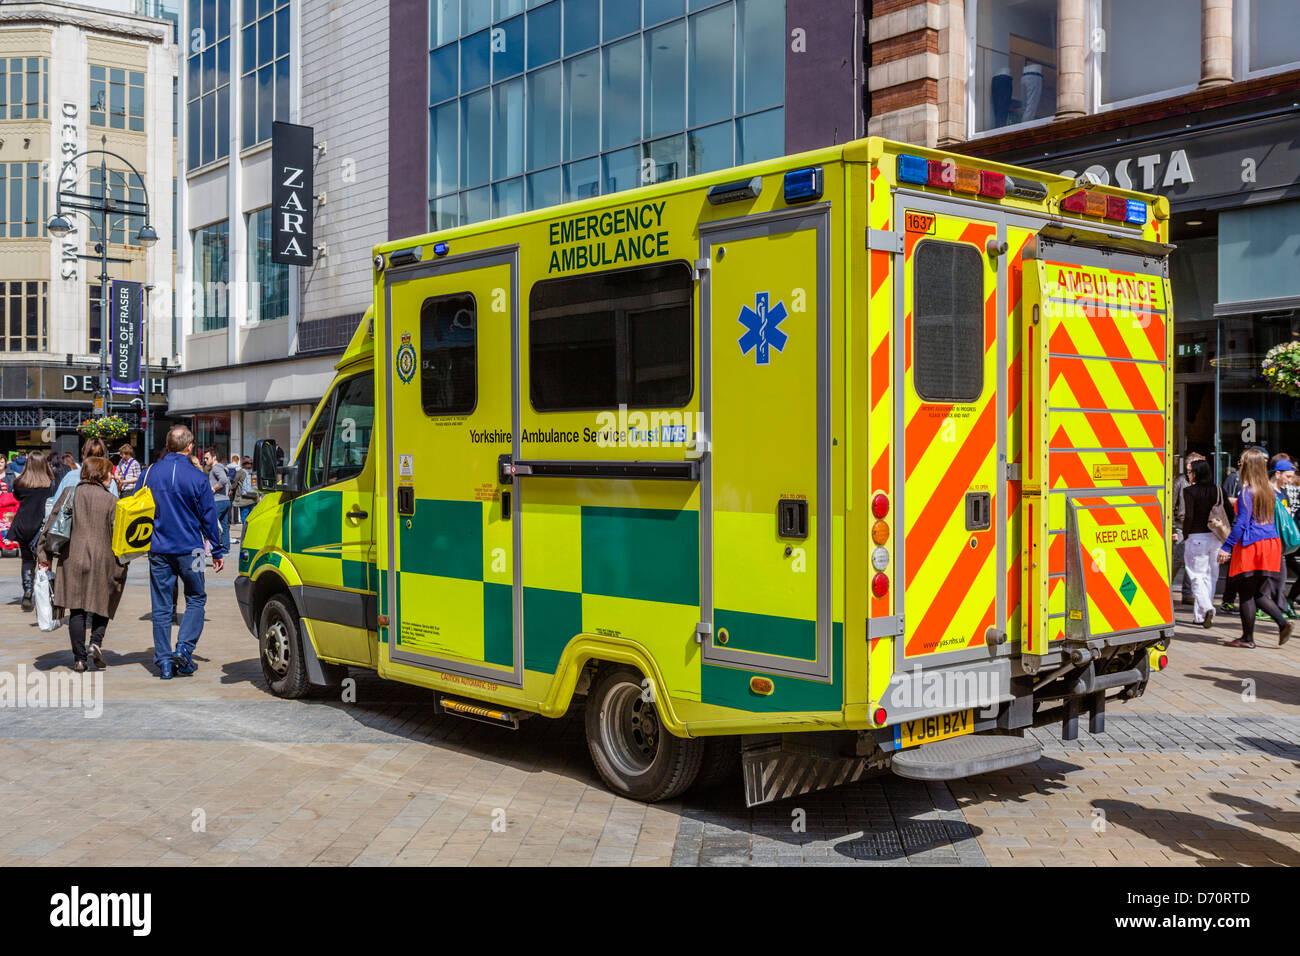 Yorkshire Ambulance Service ambulance on Briggate in the city centre, Leeds, West Yorkshire, UK - Stock Image